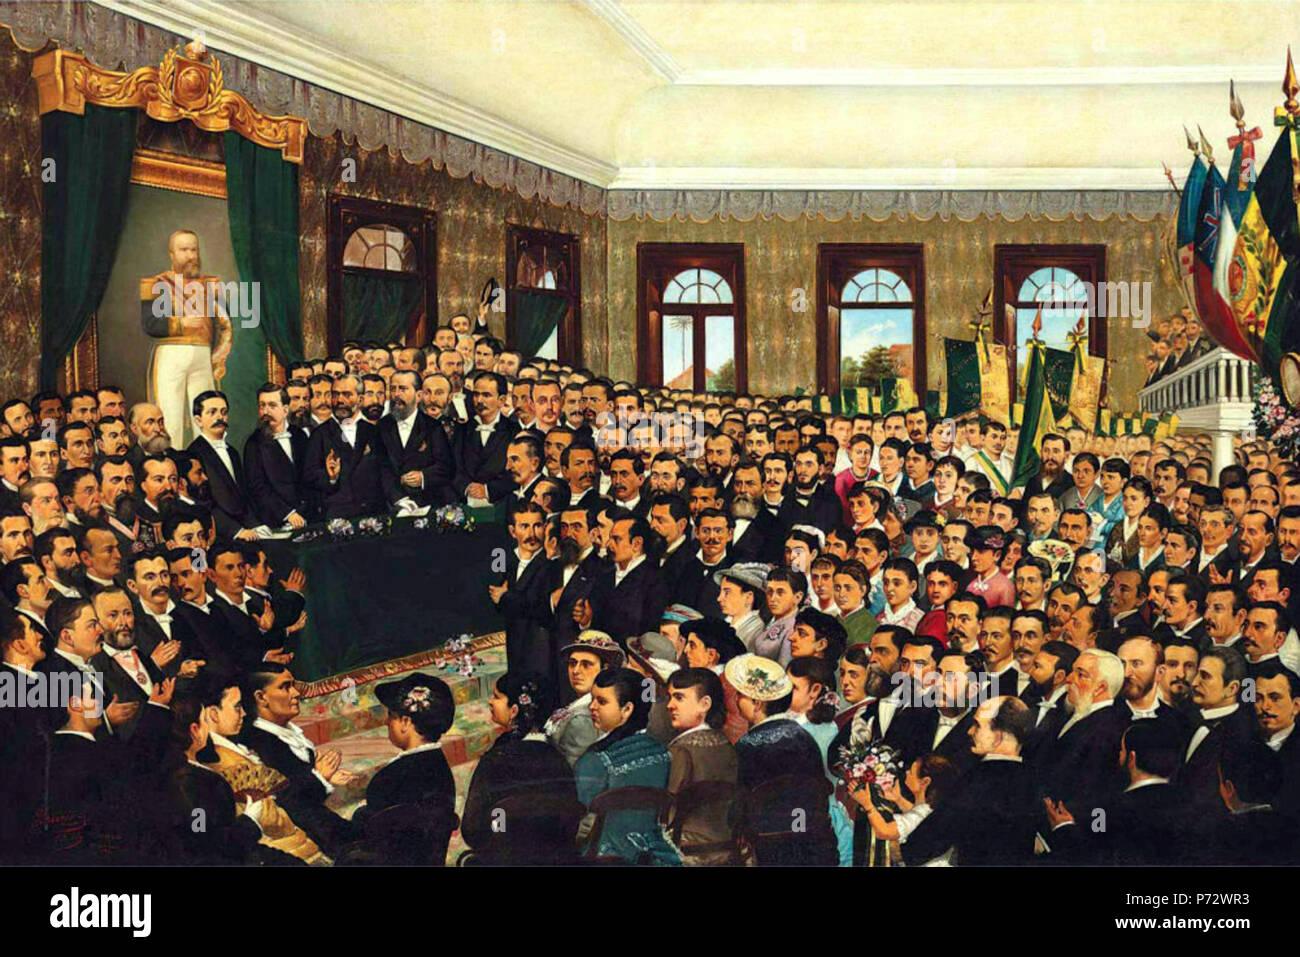 149 José Irineu de Souza - Fortaleza Liberta - Stock Image